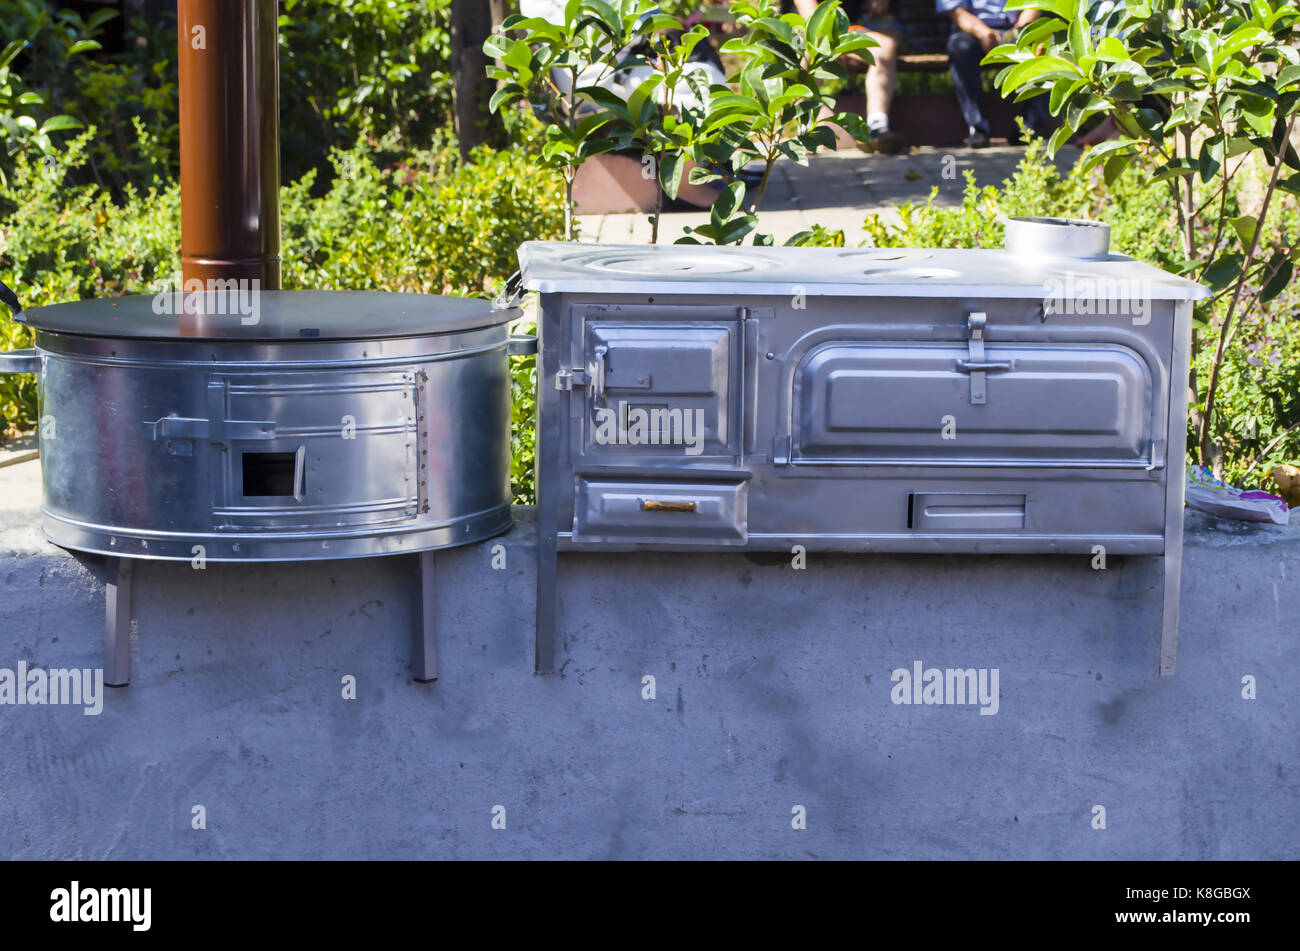 old retro oven - Stock Image